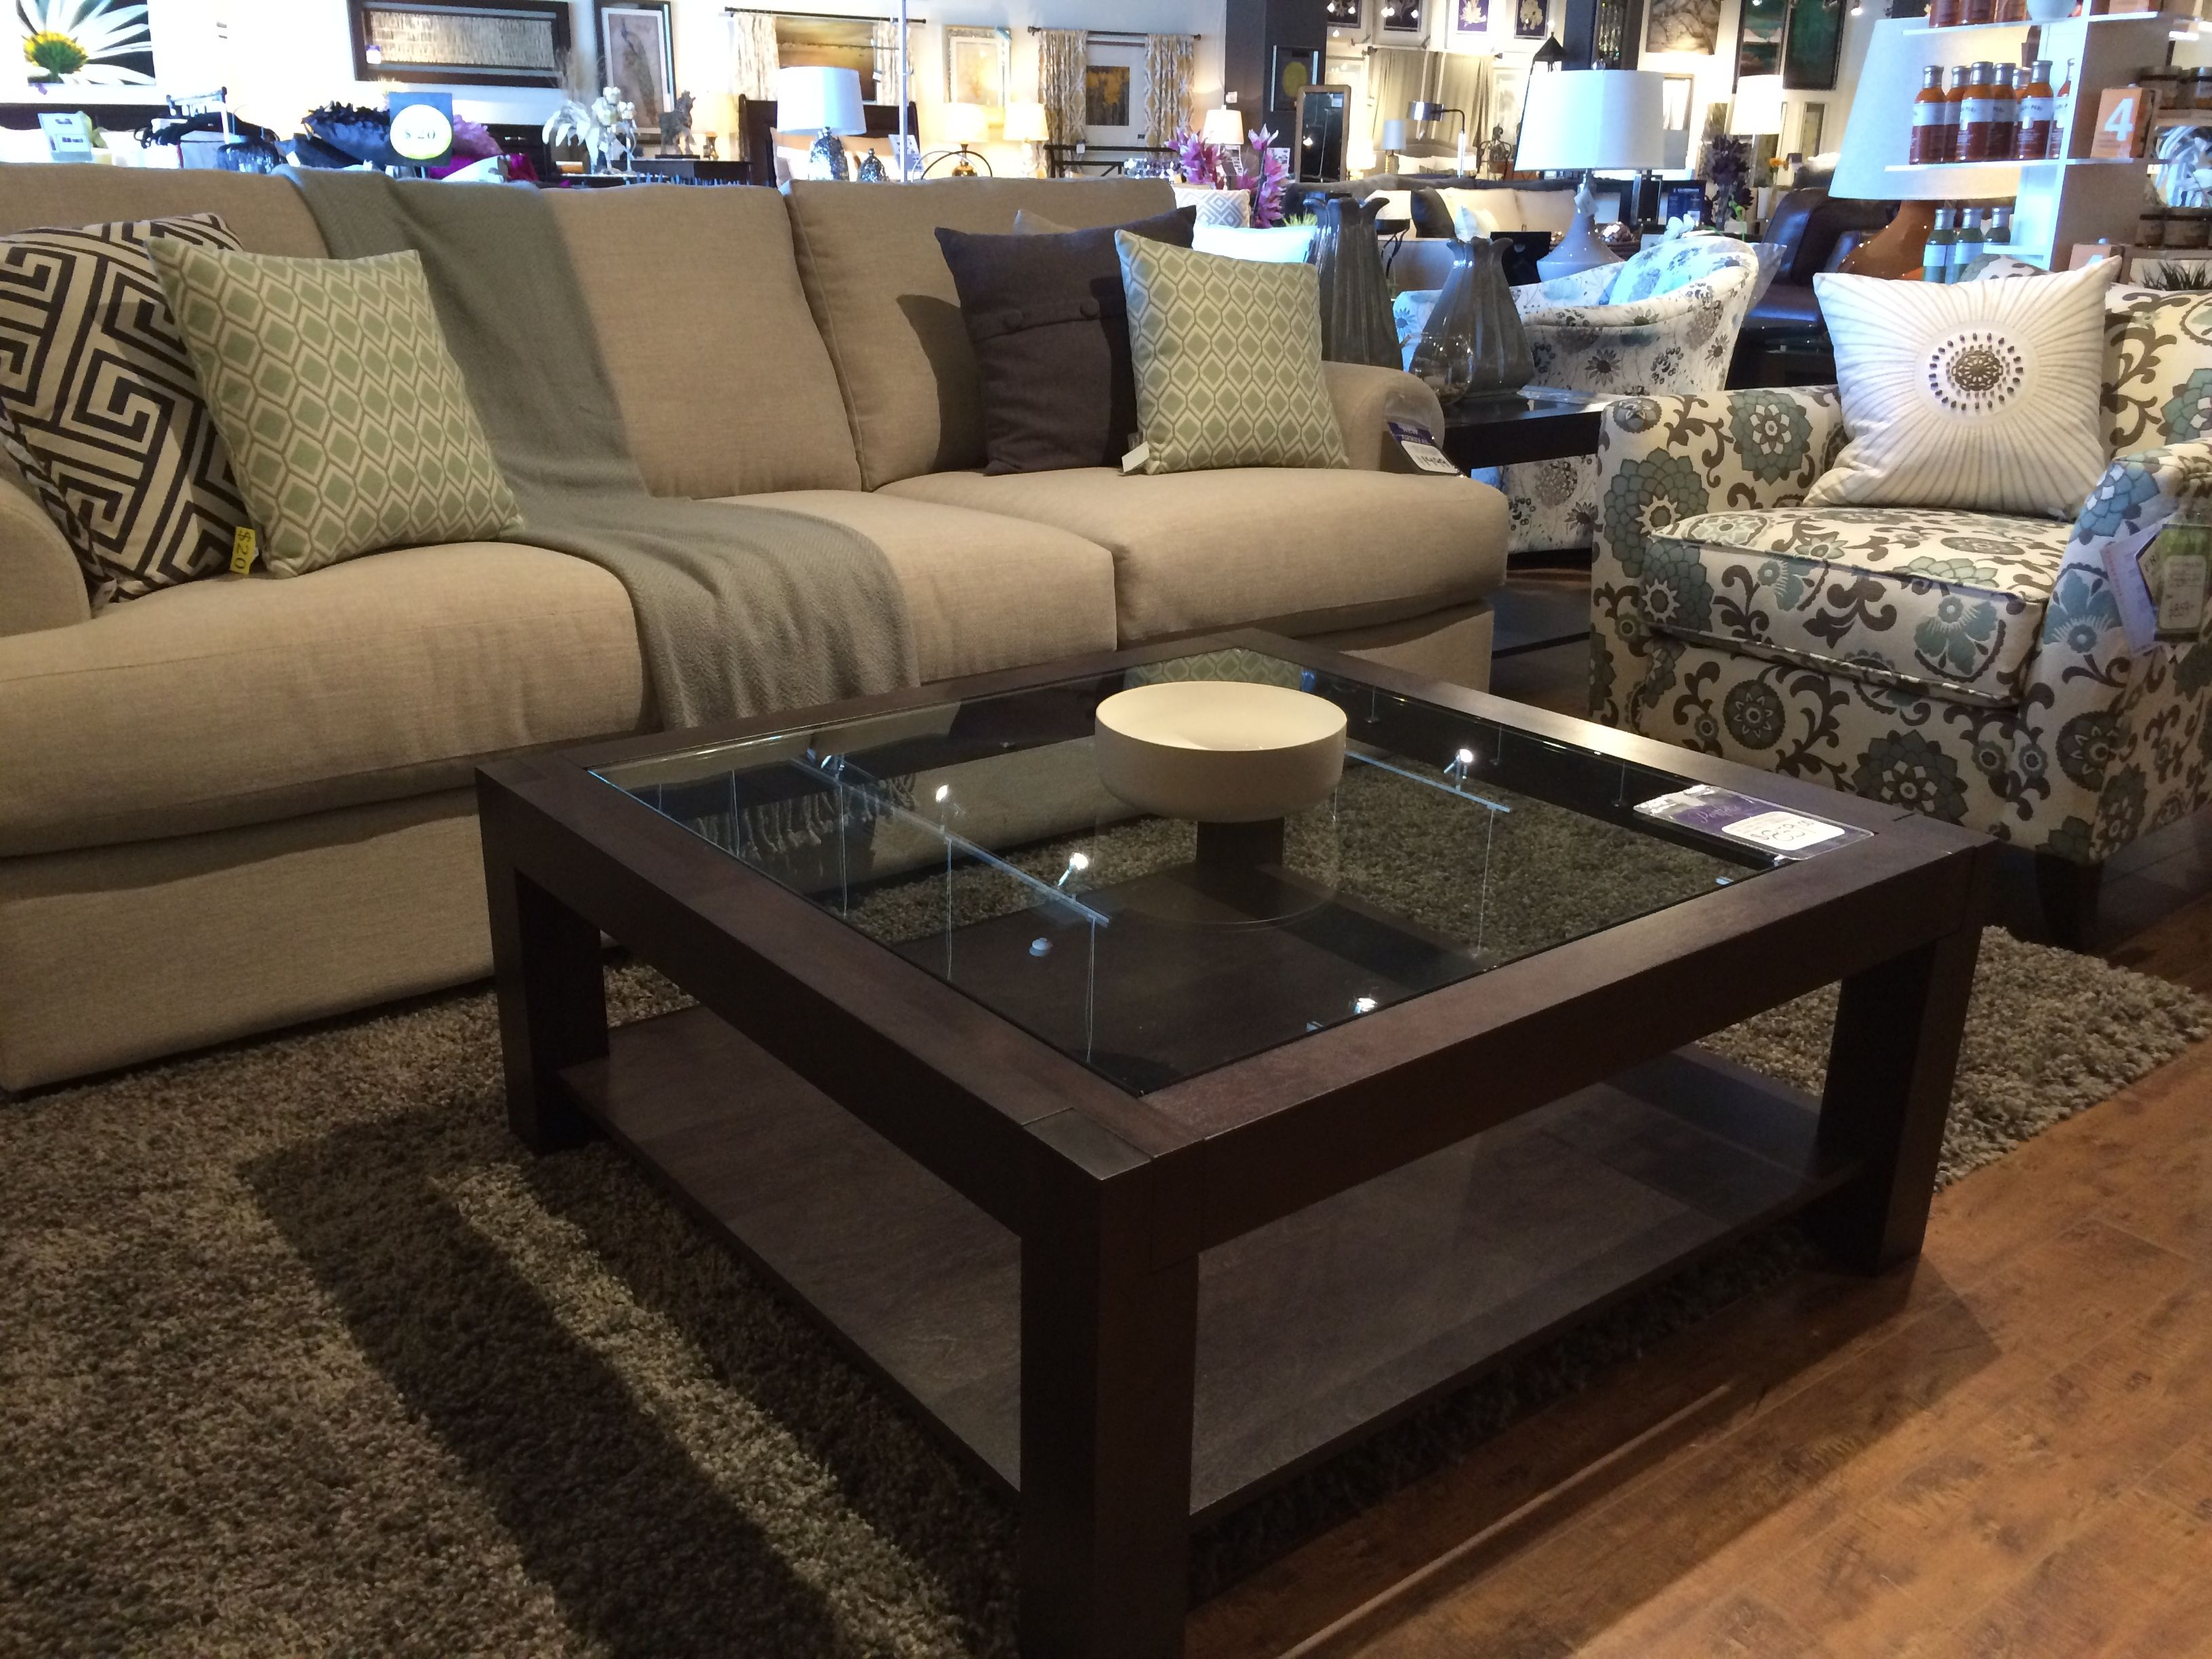 Stupendous New Orleans Sofa By Palliser Chair By Decor Rest Joe Uwap Interior Chair Design Uwaporg